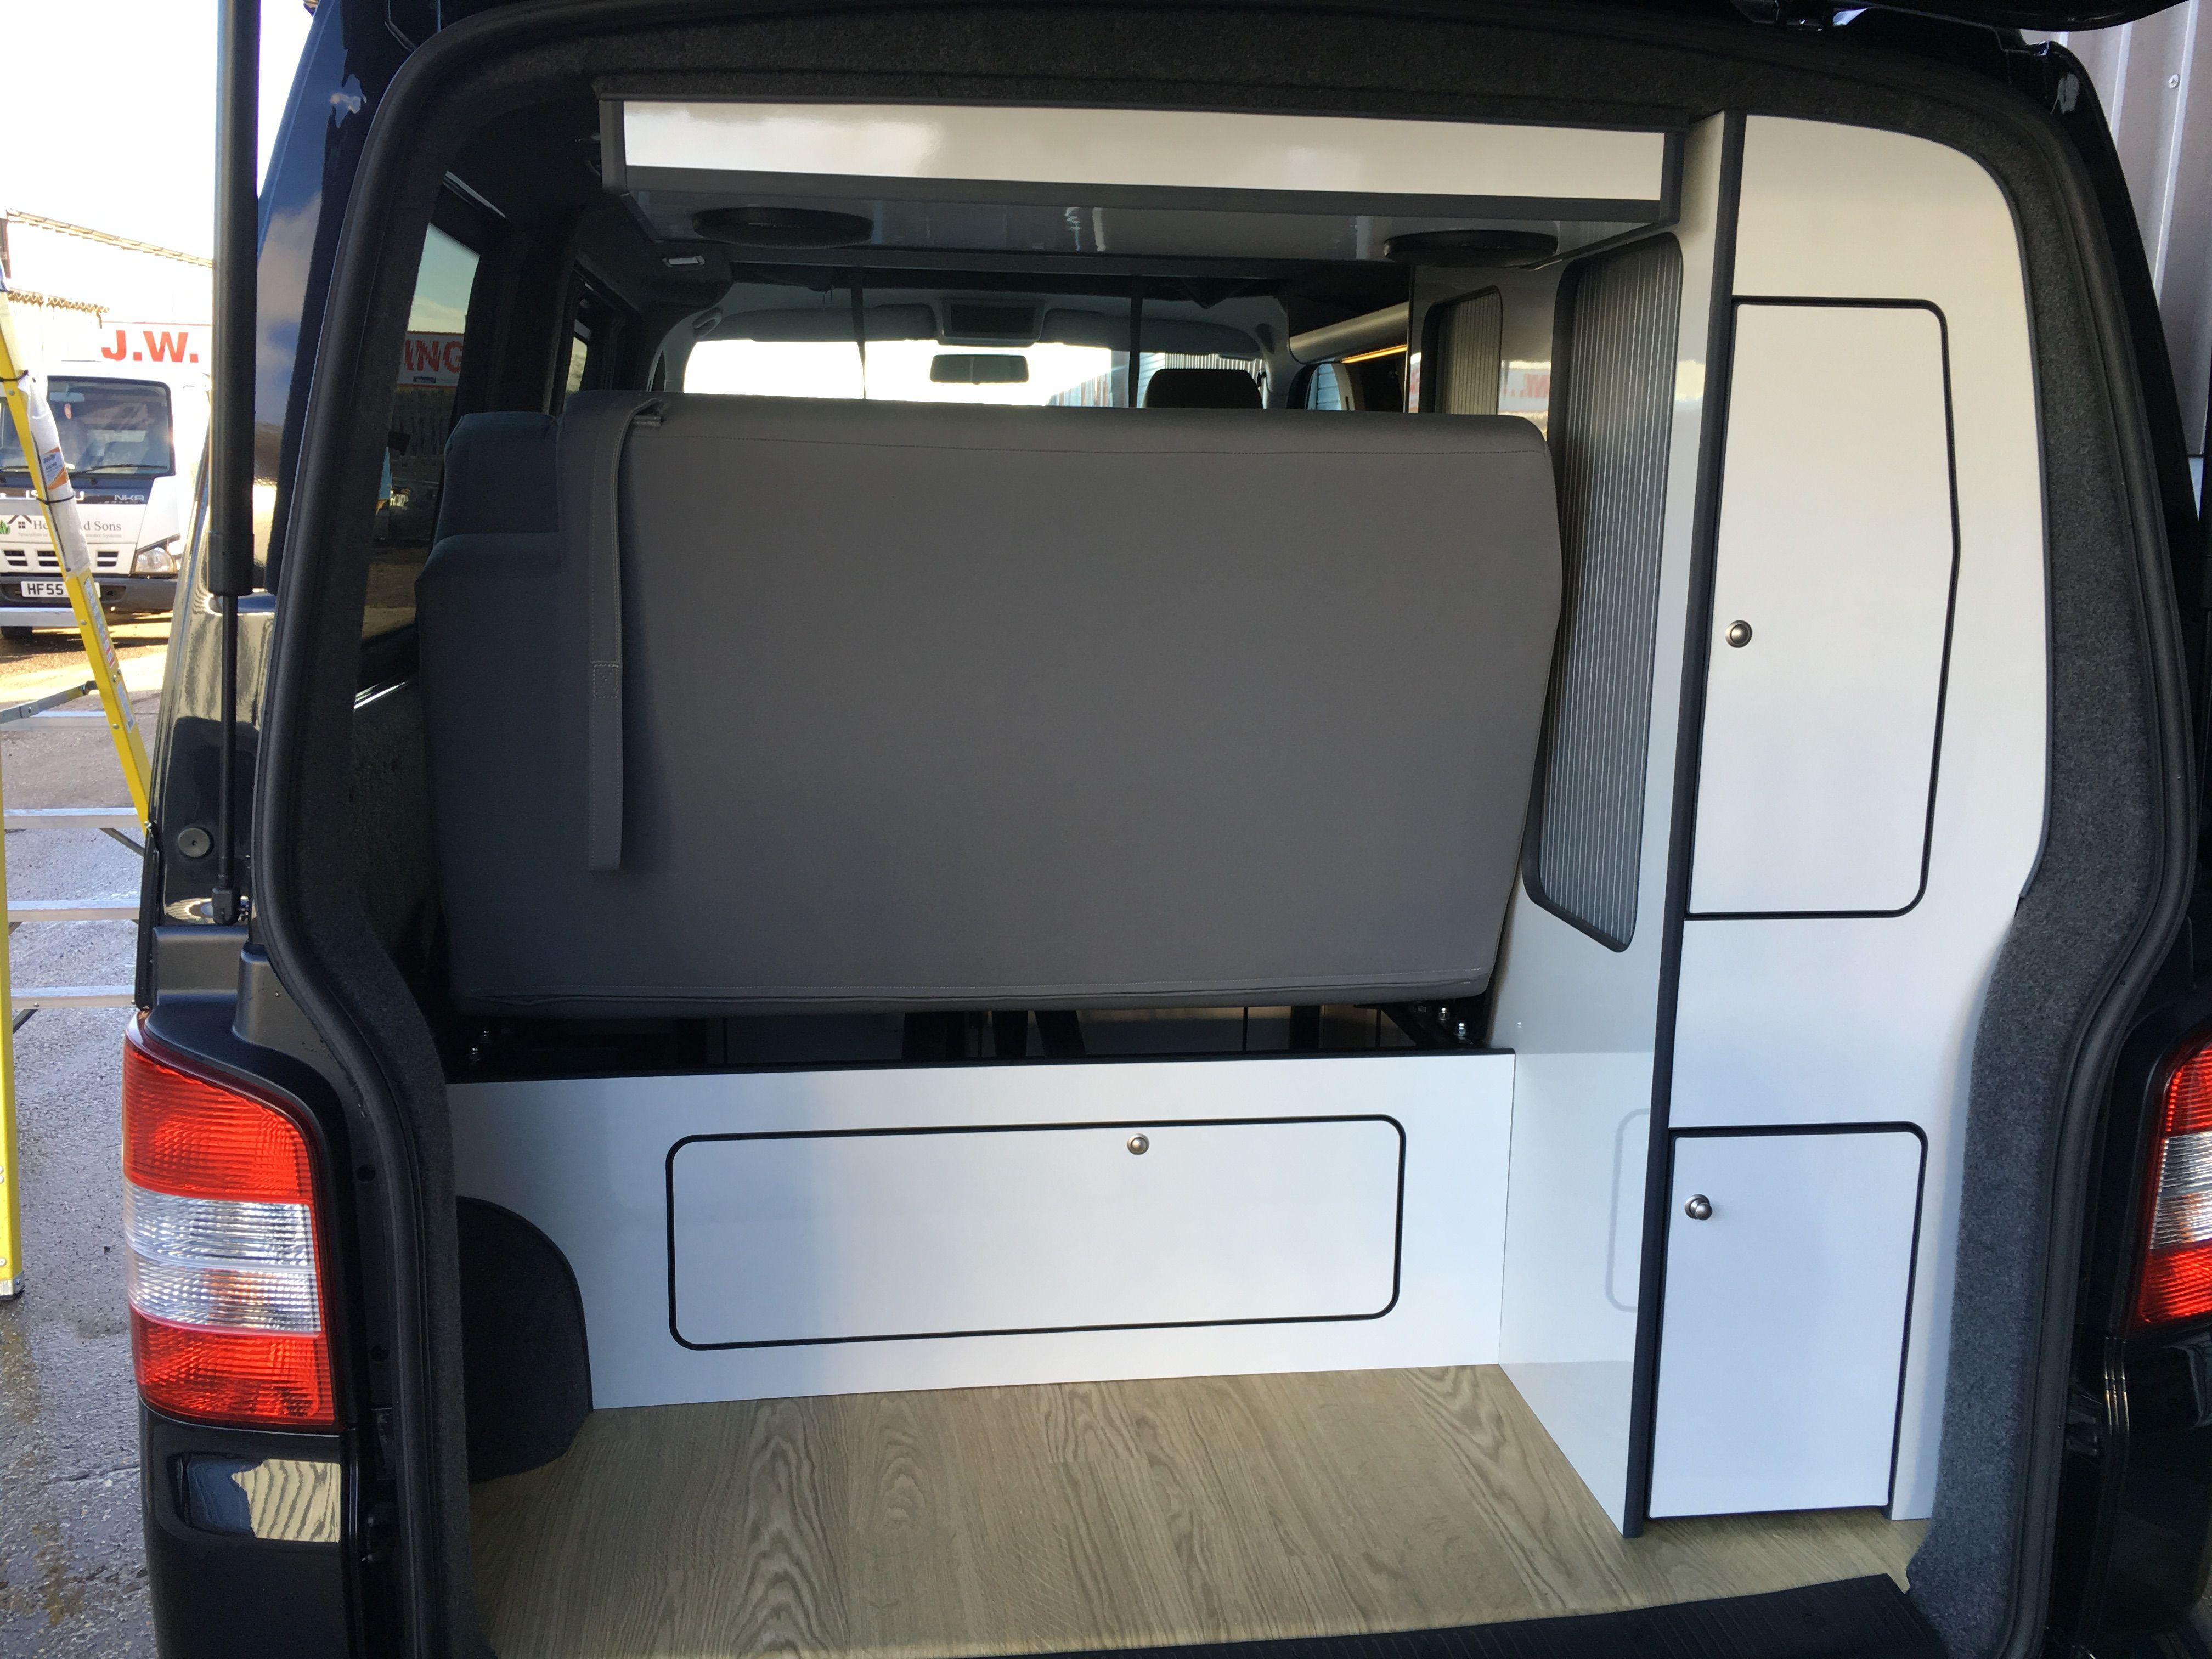 Gallery – Van Creations | Vans, RVs, Small Spaces | Pinterest